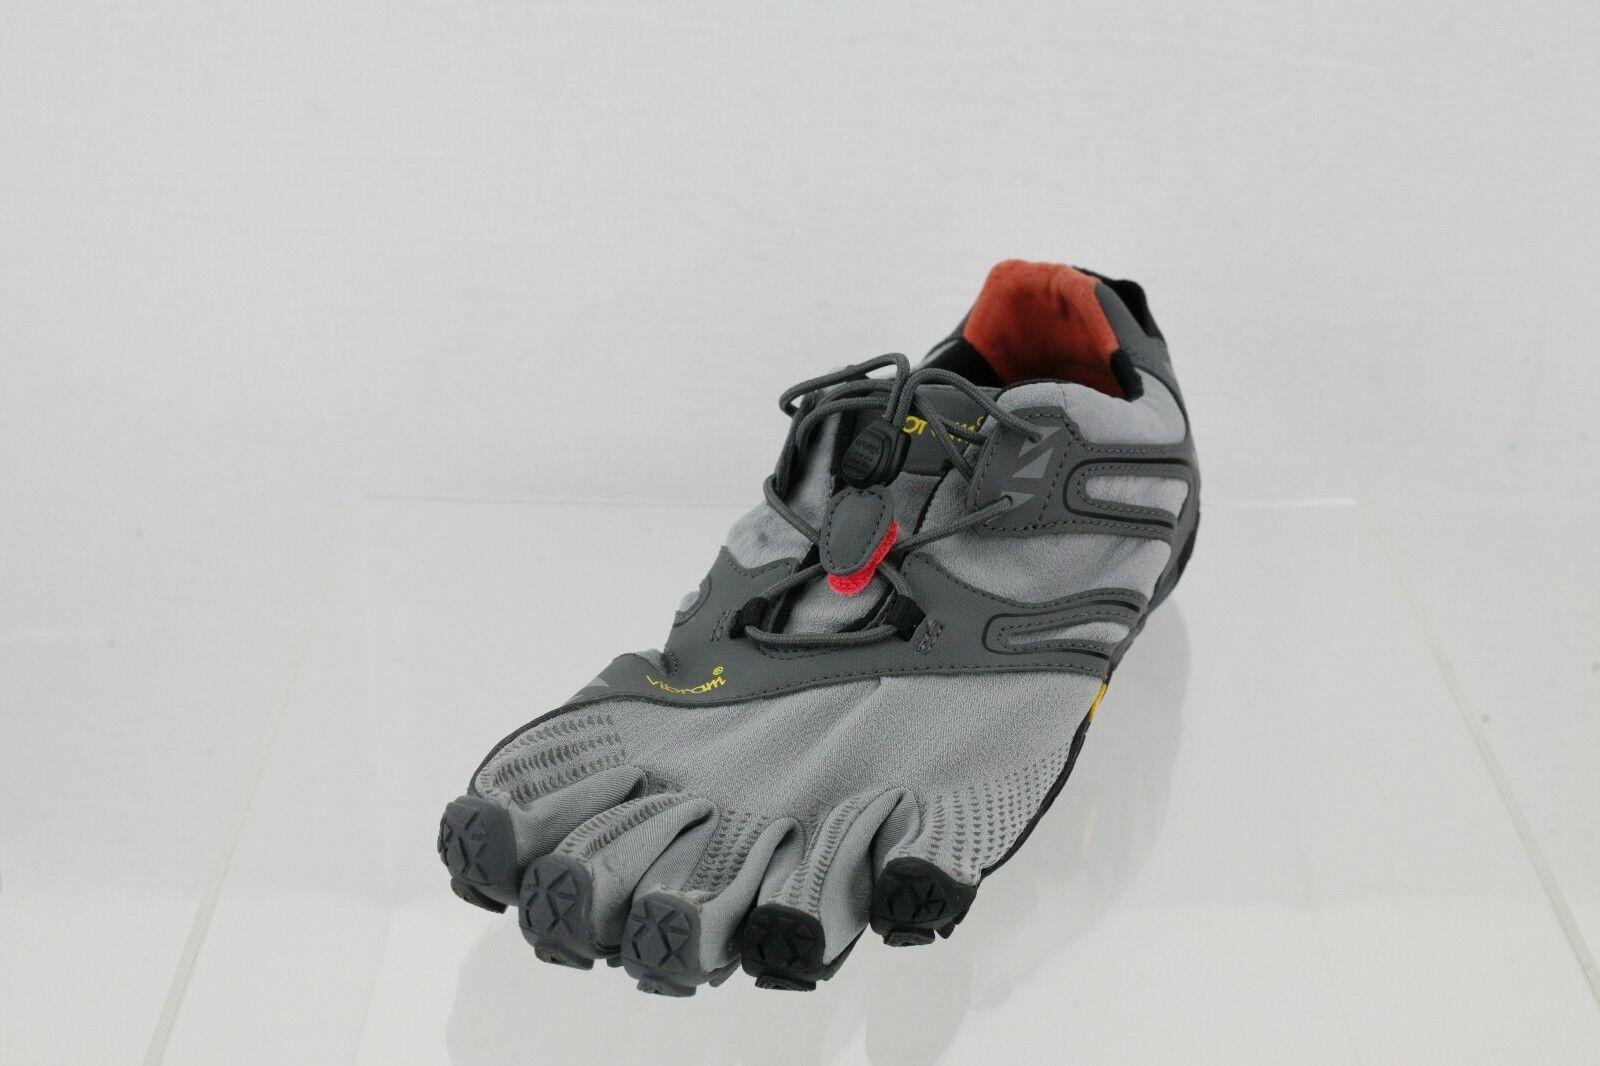 Vibram FiveFingers V-Trail 17W6906 17W6906 17W6906 Grey Black Women's shoes Size US 9-9.5 NEW f0d4f9